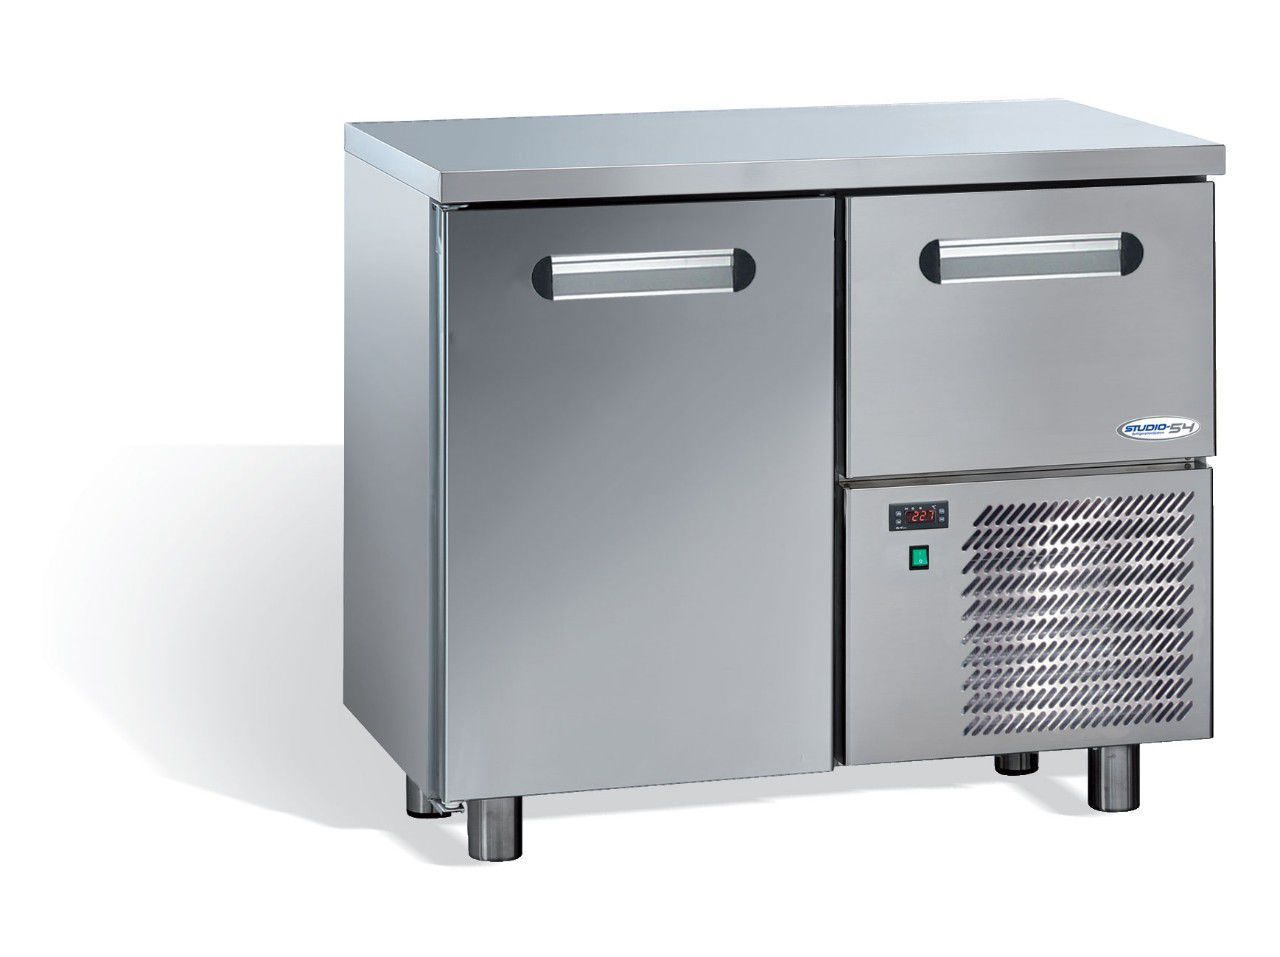 kühl unterschrank / profi-küche - p.550 : 66250060 - studio 54